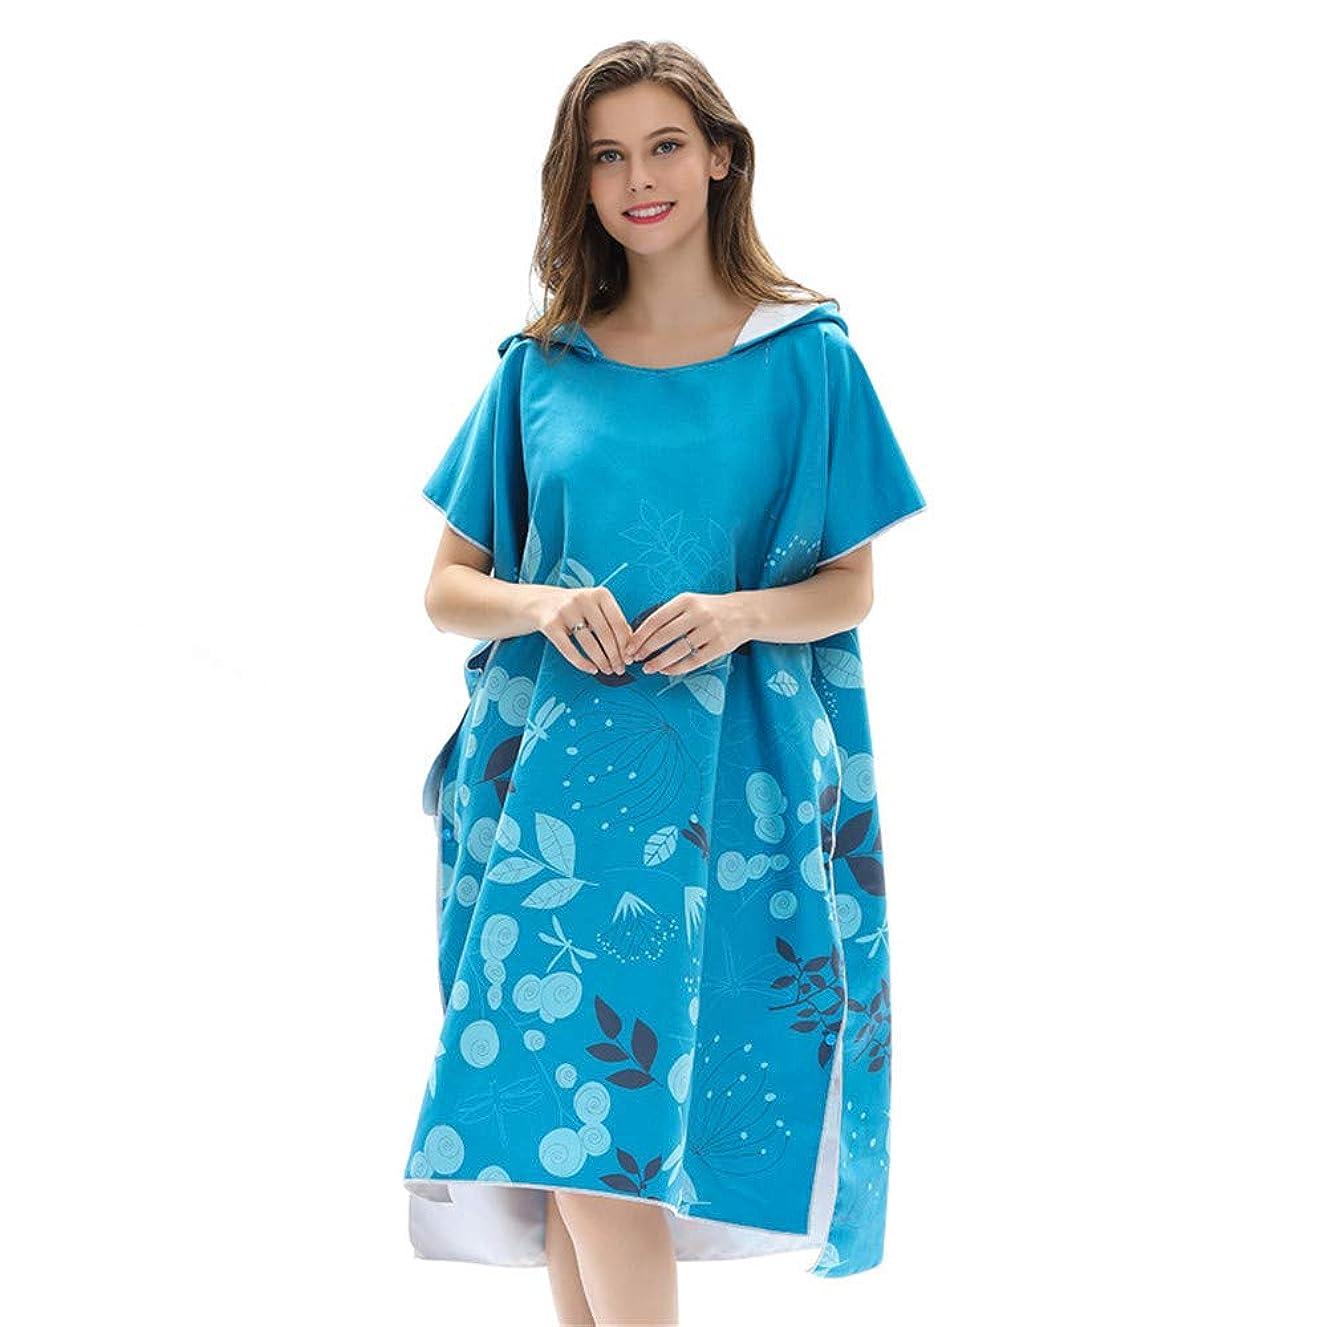 JIANGXIUQIN Beach Poncho Towel Changing Robes Surfing Poncho Towel with Hood Cartoon Print Changing Bathrobe Blue Surfing Swimming Robe